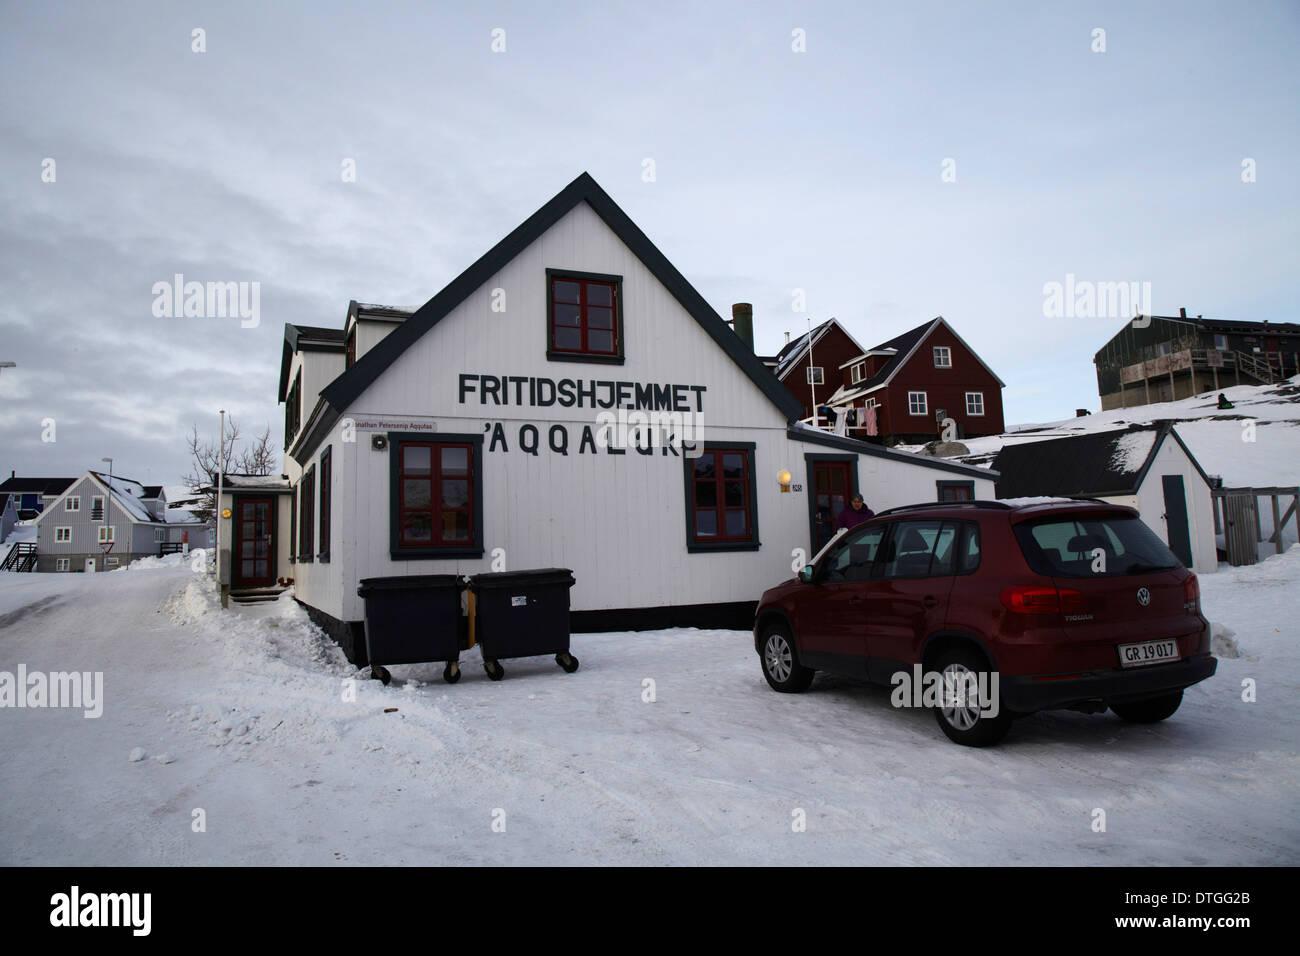 A kindergarten in Nuuk, Greenland - Stock Image